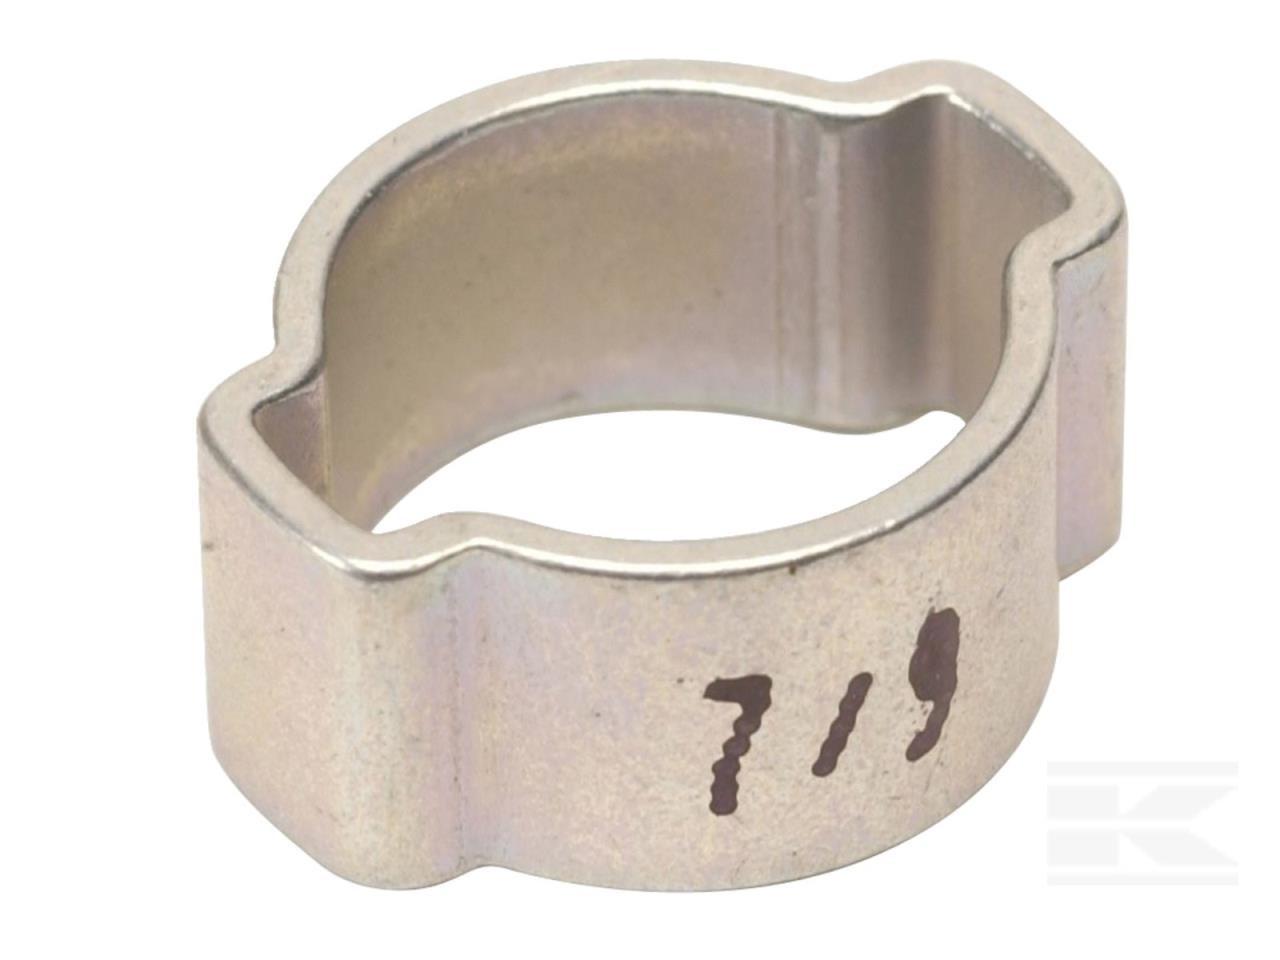 Øreclamp, ABA 7-9mm